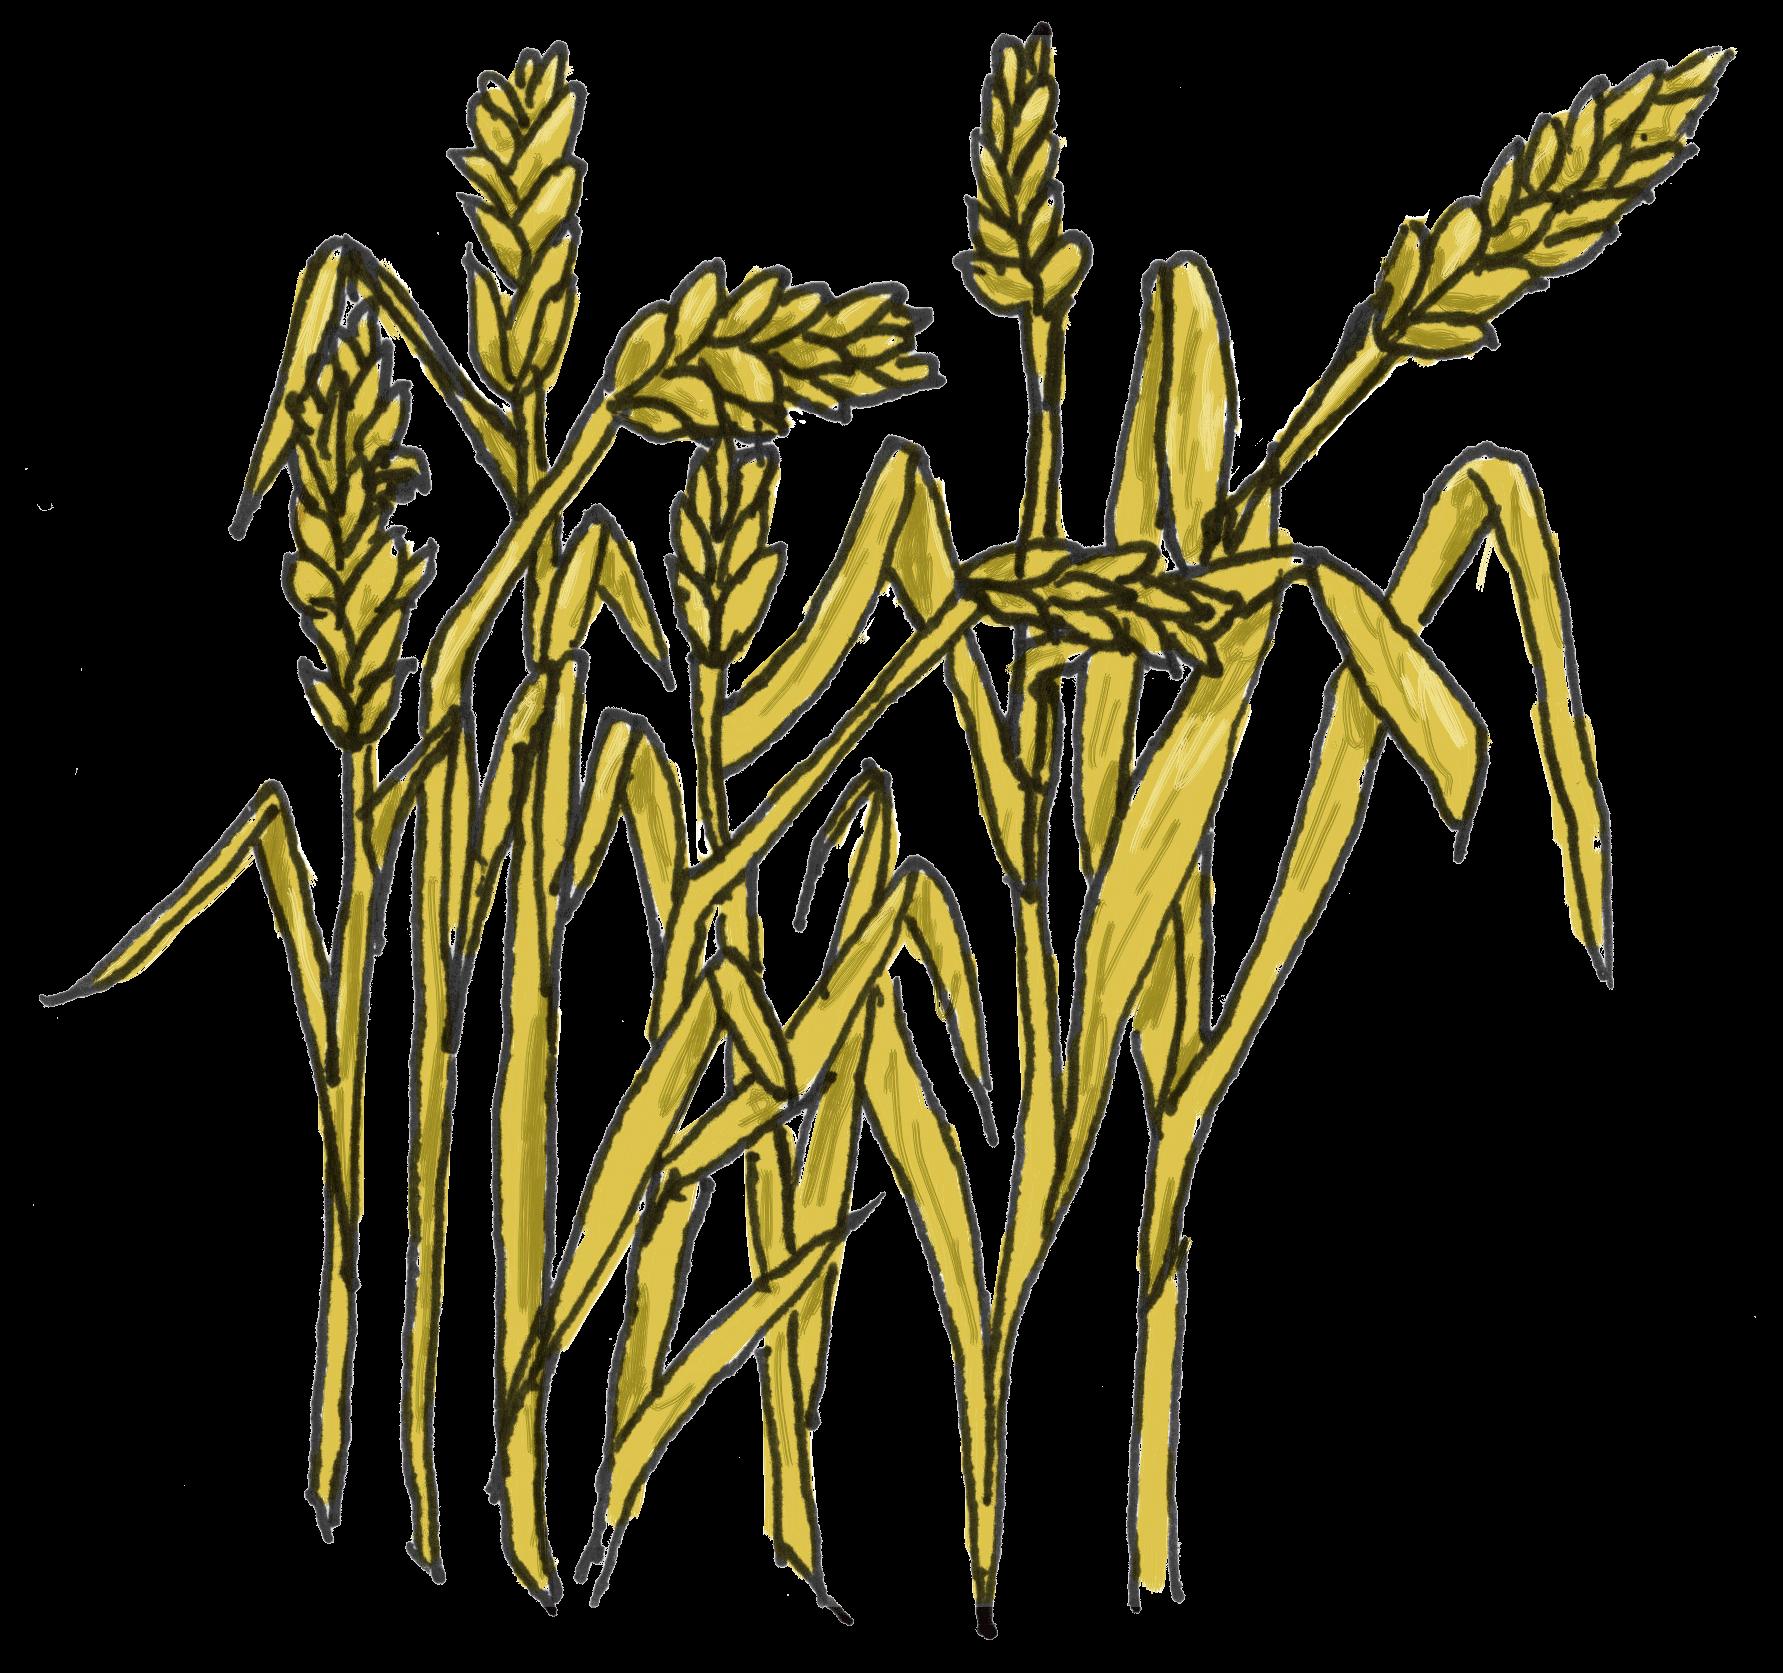 Grain Clipart.